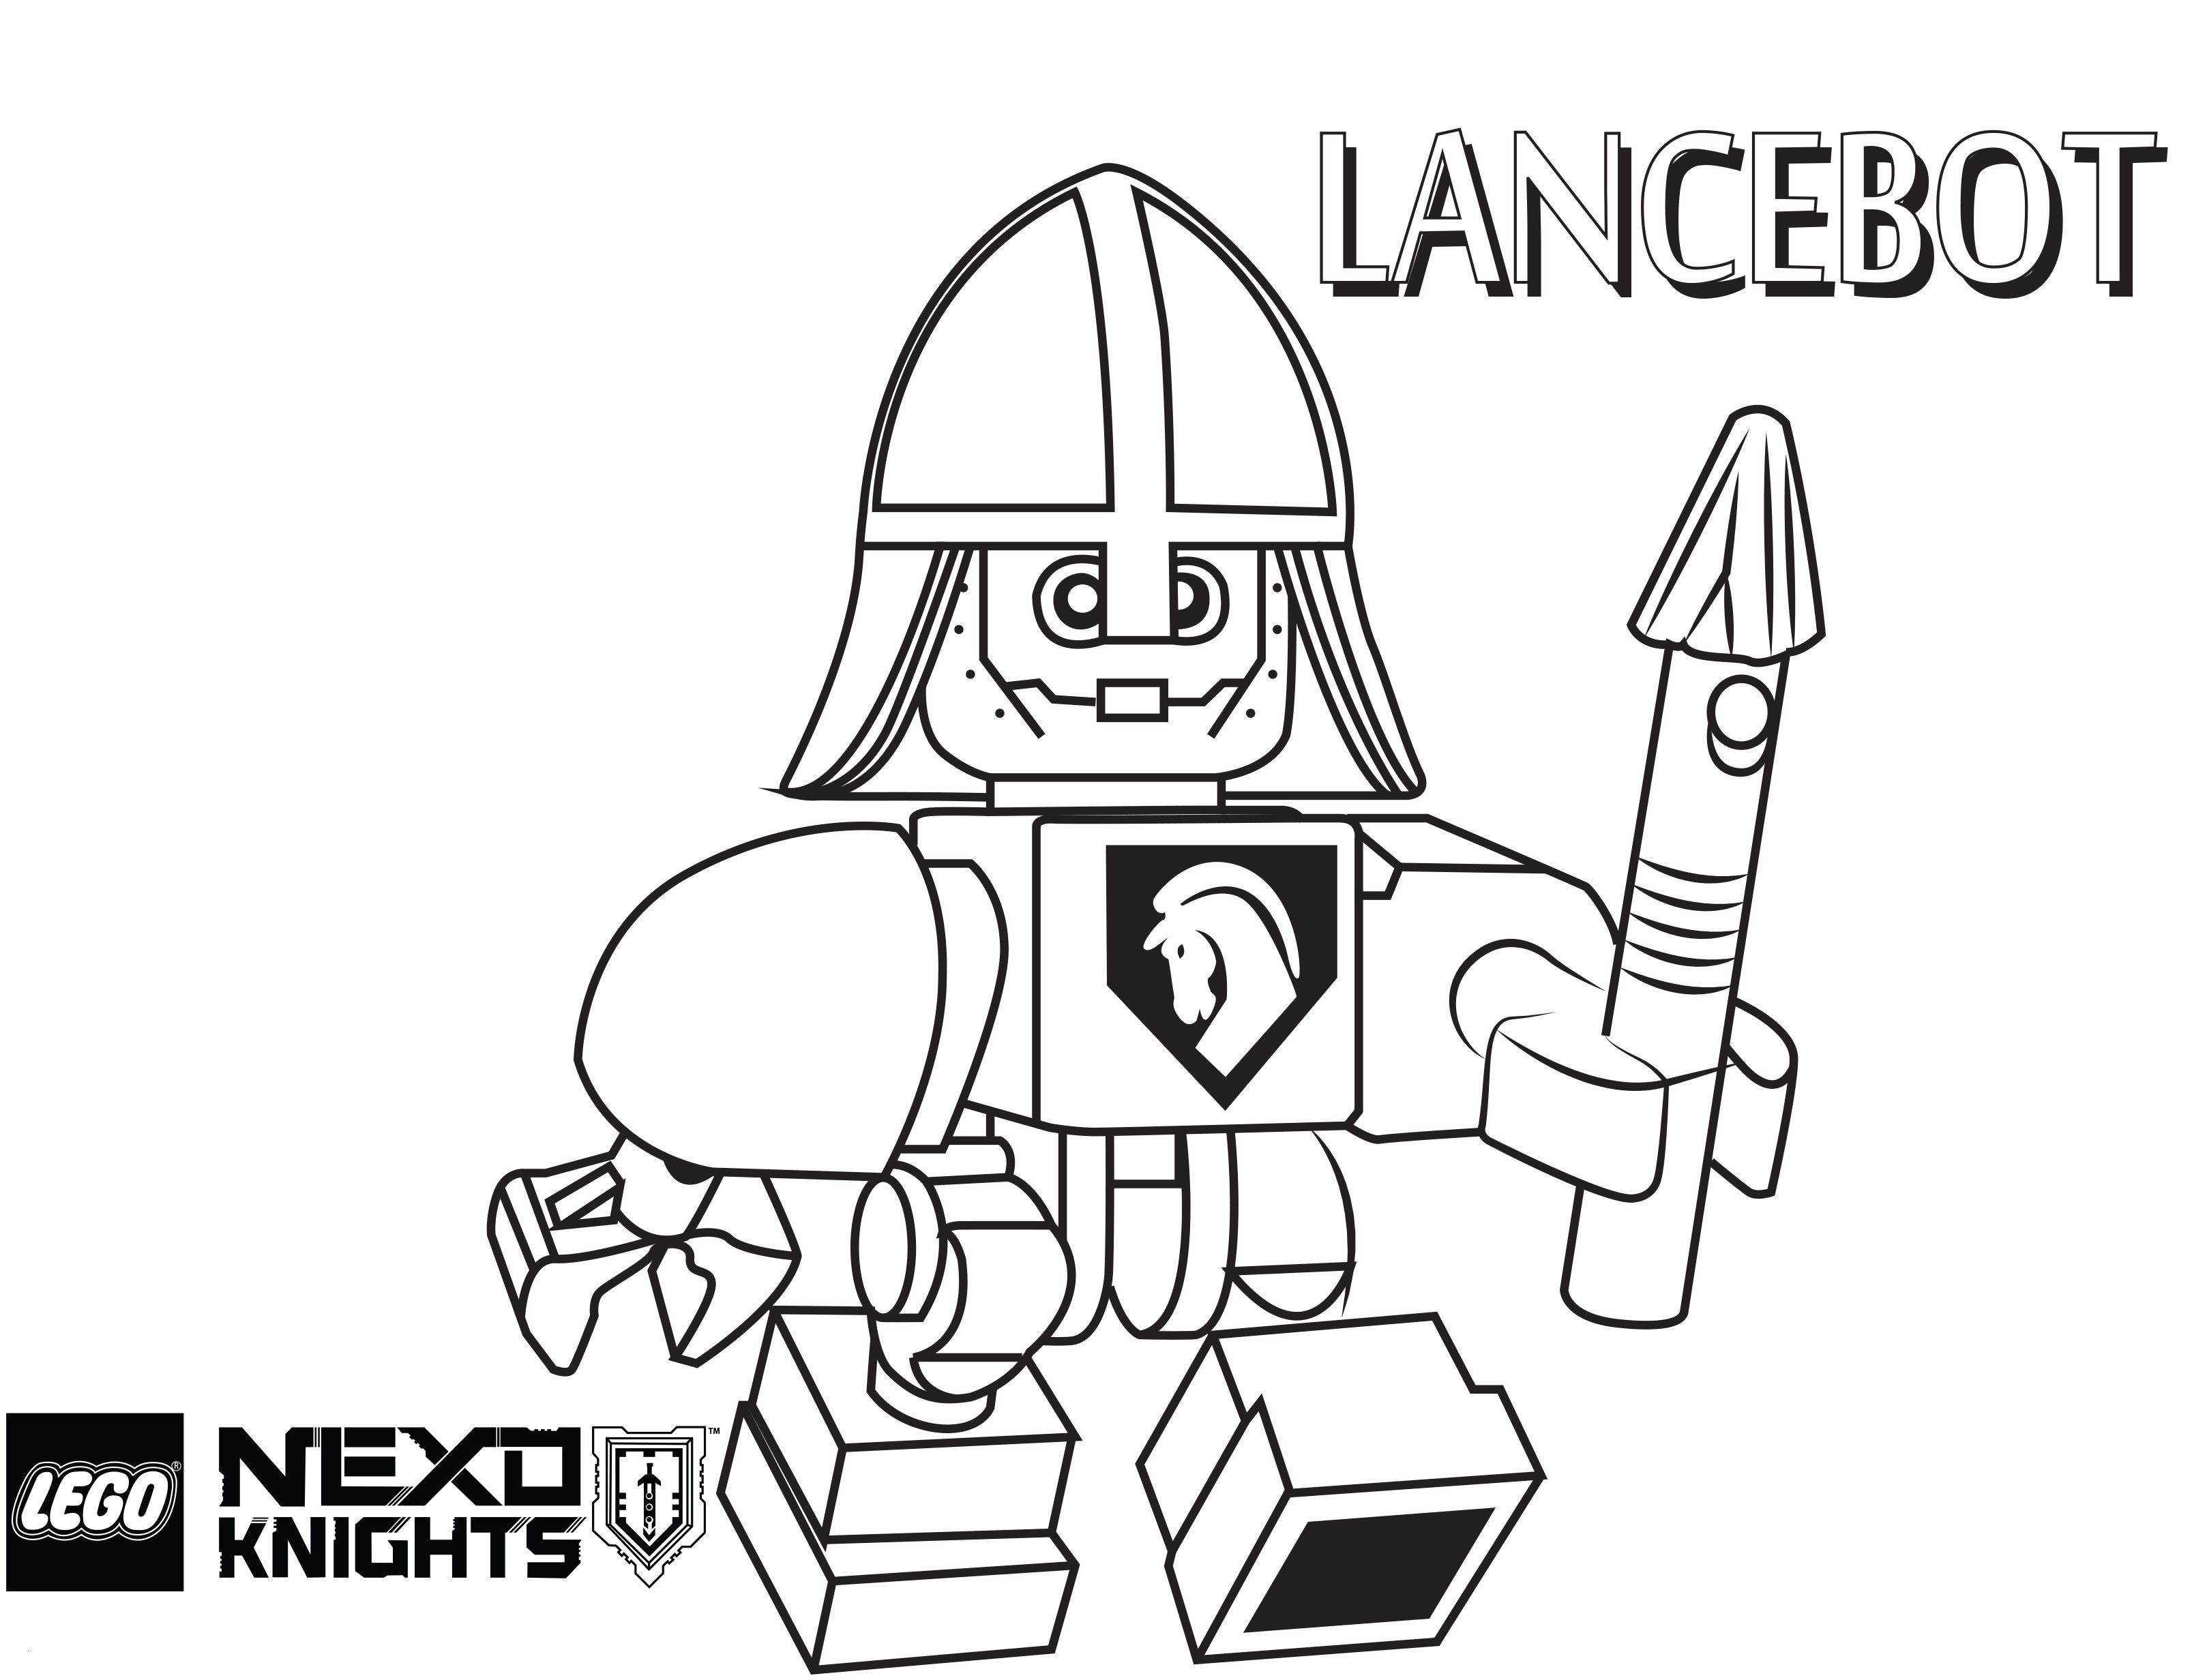 Ausmalbild Lego Batman Frisch Lego Nexo Knights Coloring Pages Free Printable Lego Nexo Knights Sammlung